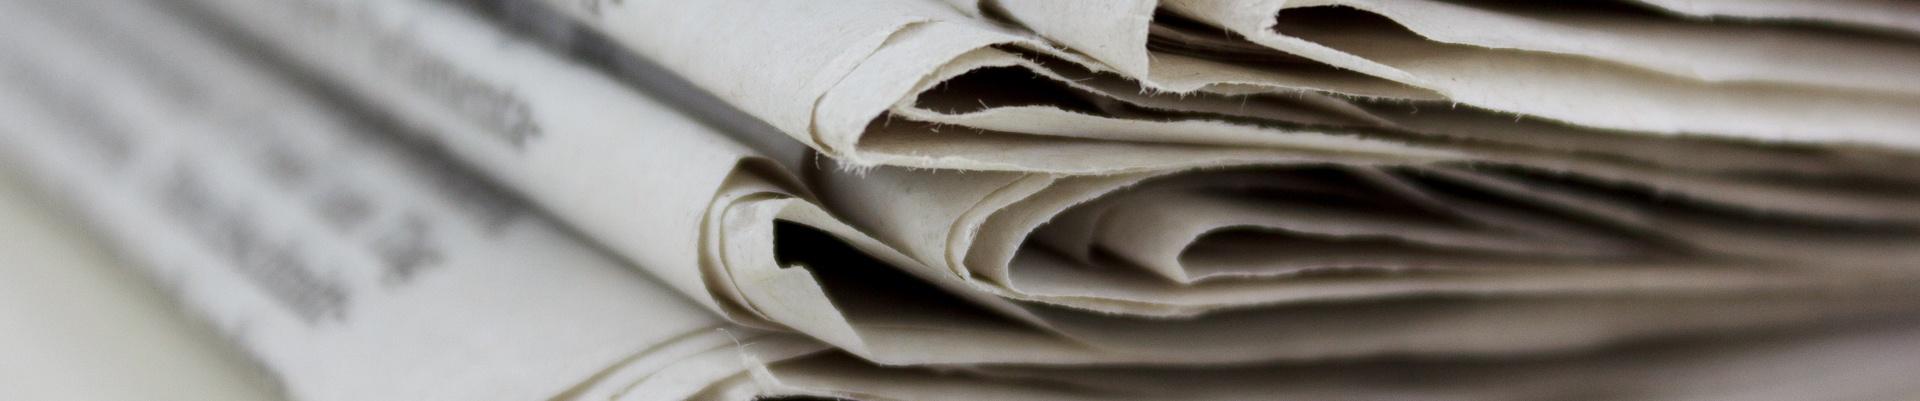 NewspaperHeader.jpg